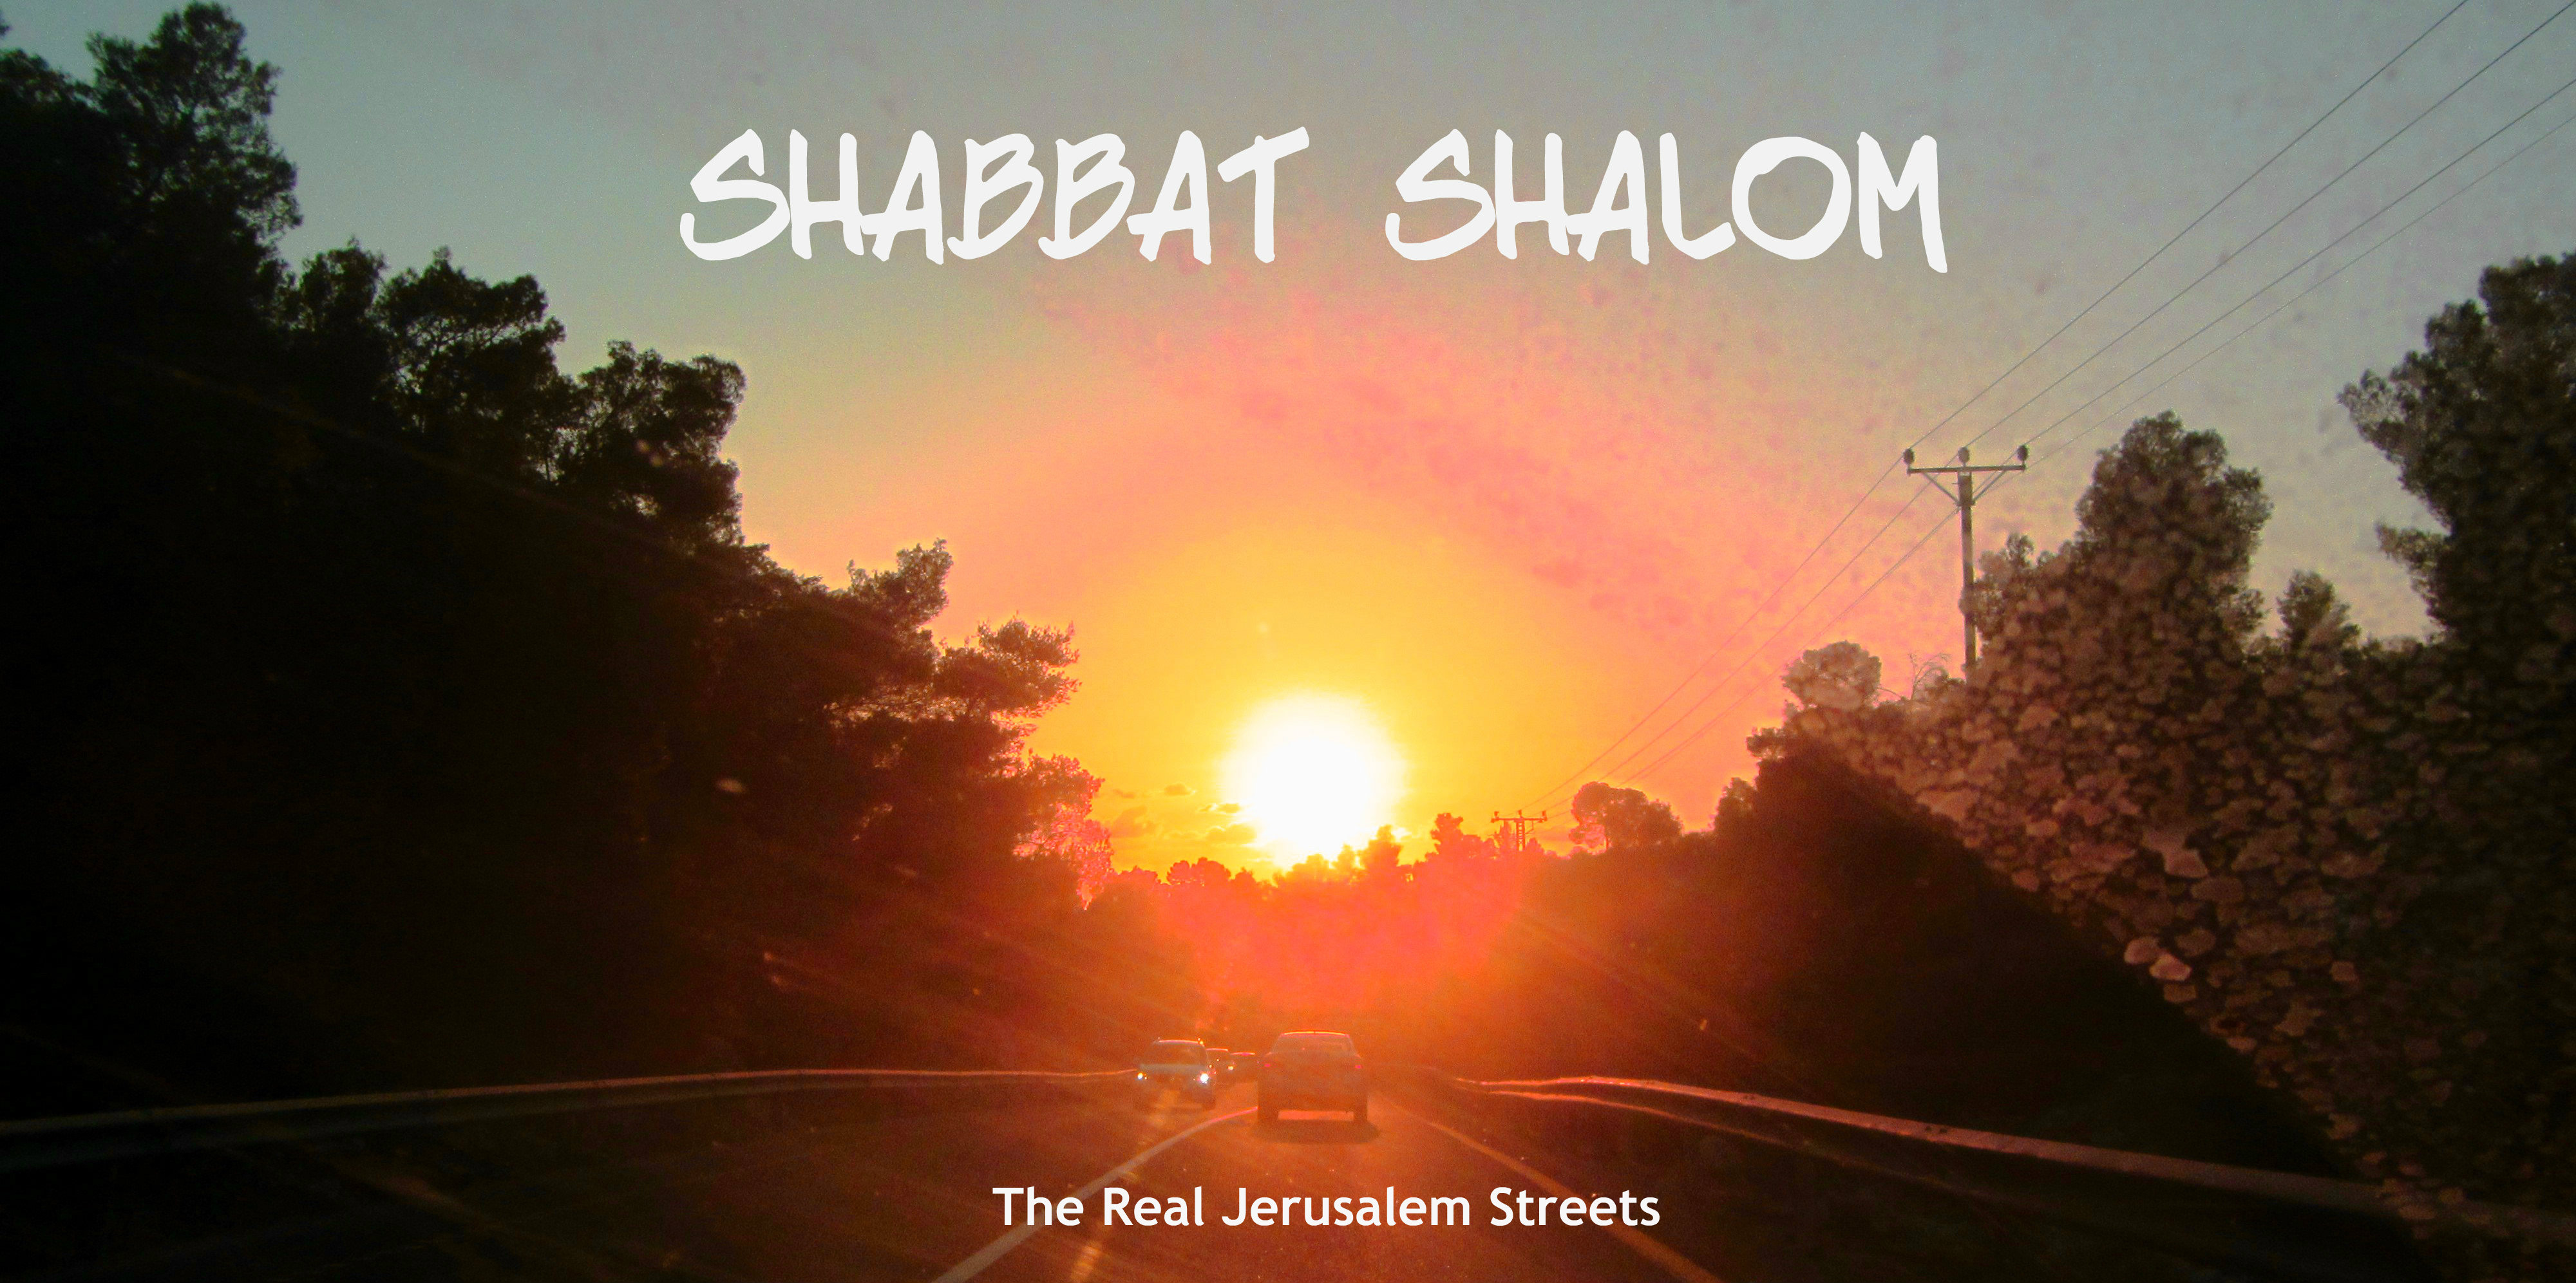 image edited Shabbat shalom poster